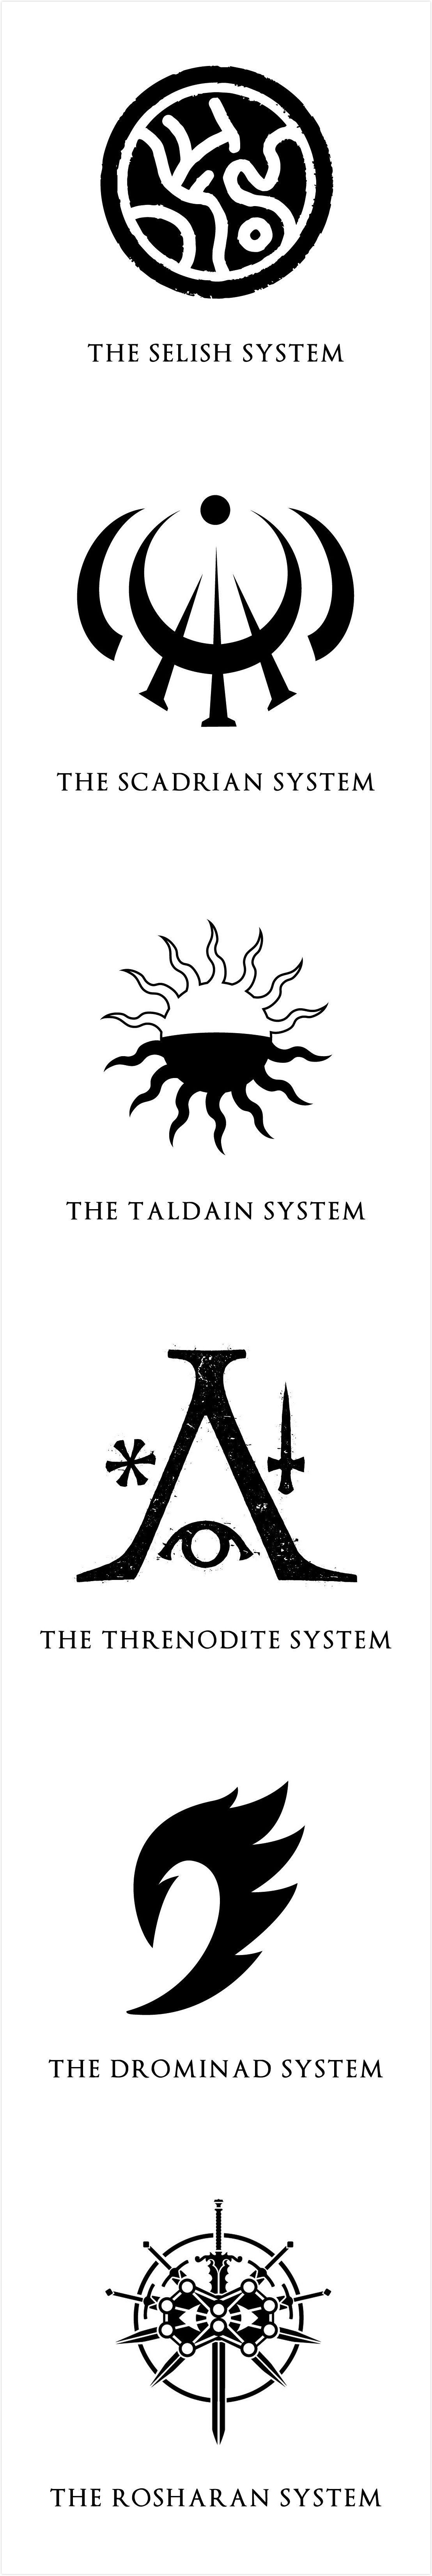 Image Result For Symbols Mistborn T Symbols And Books